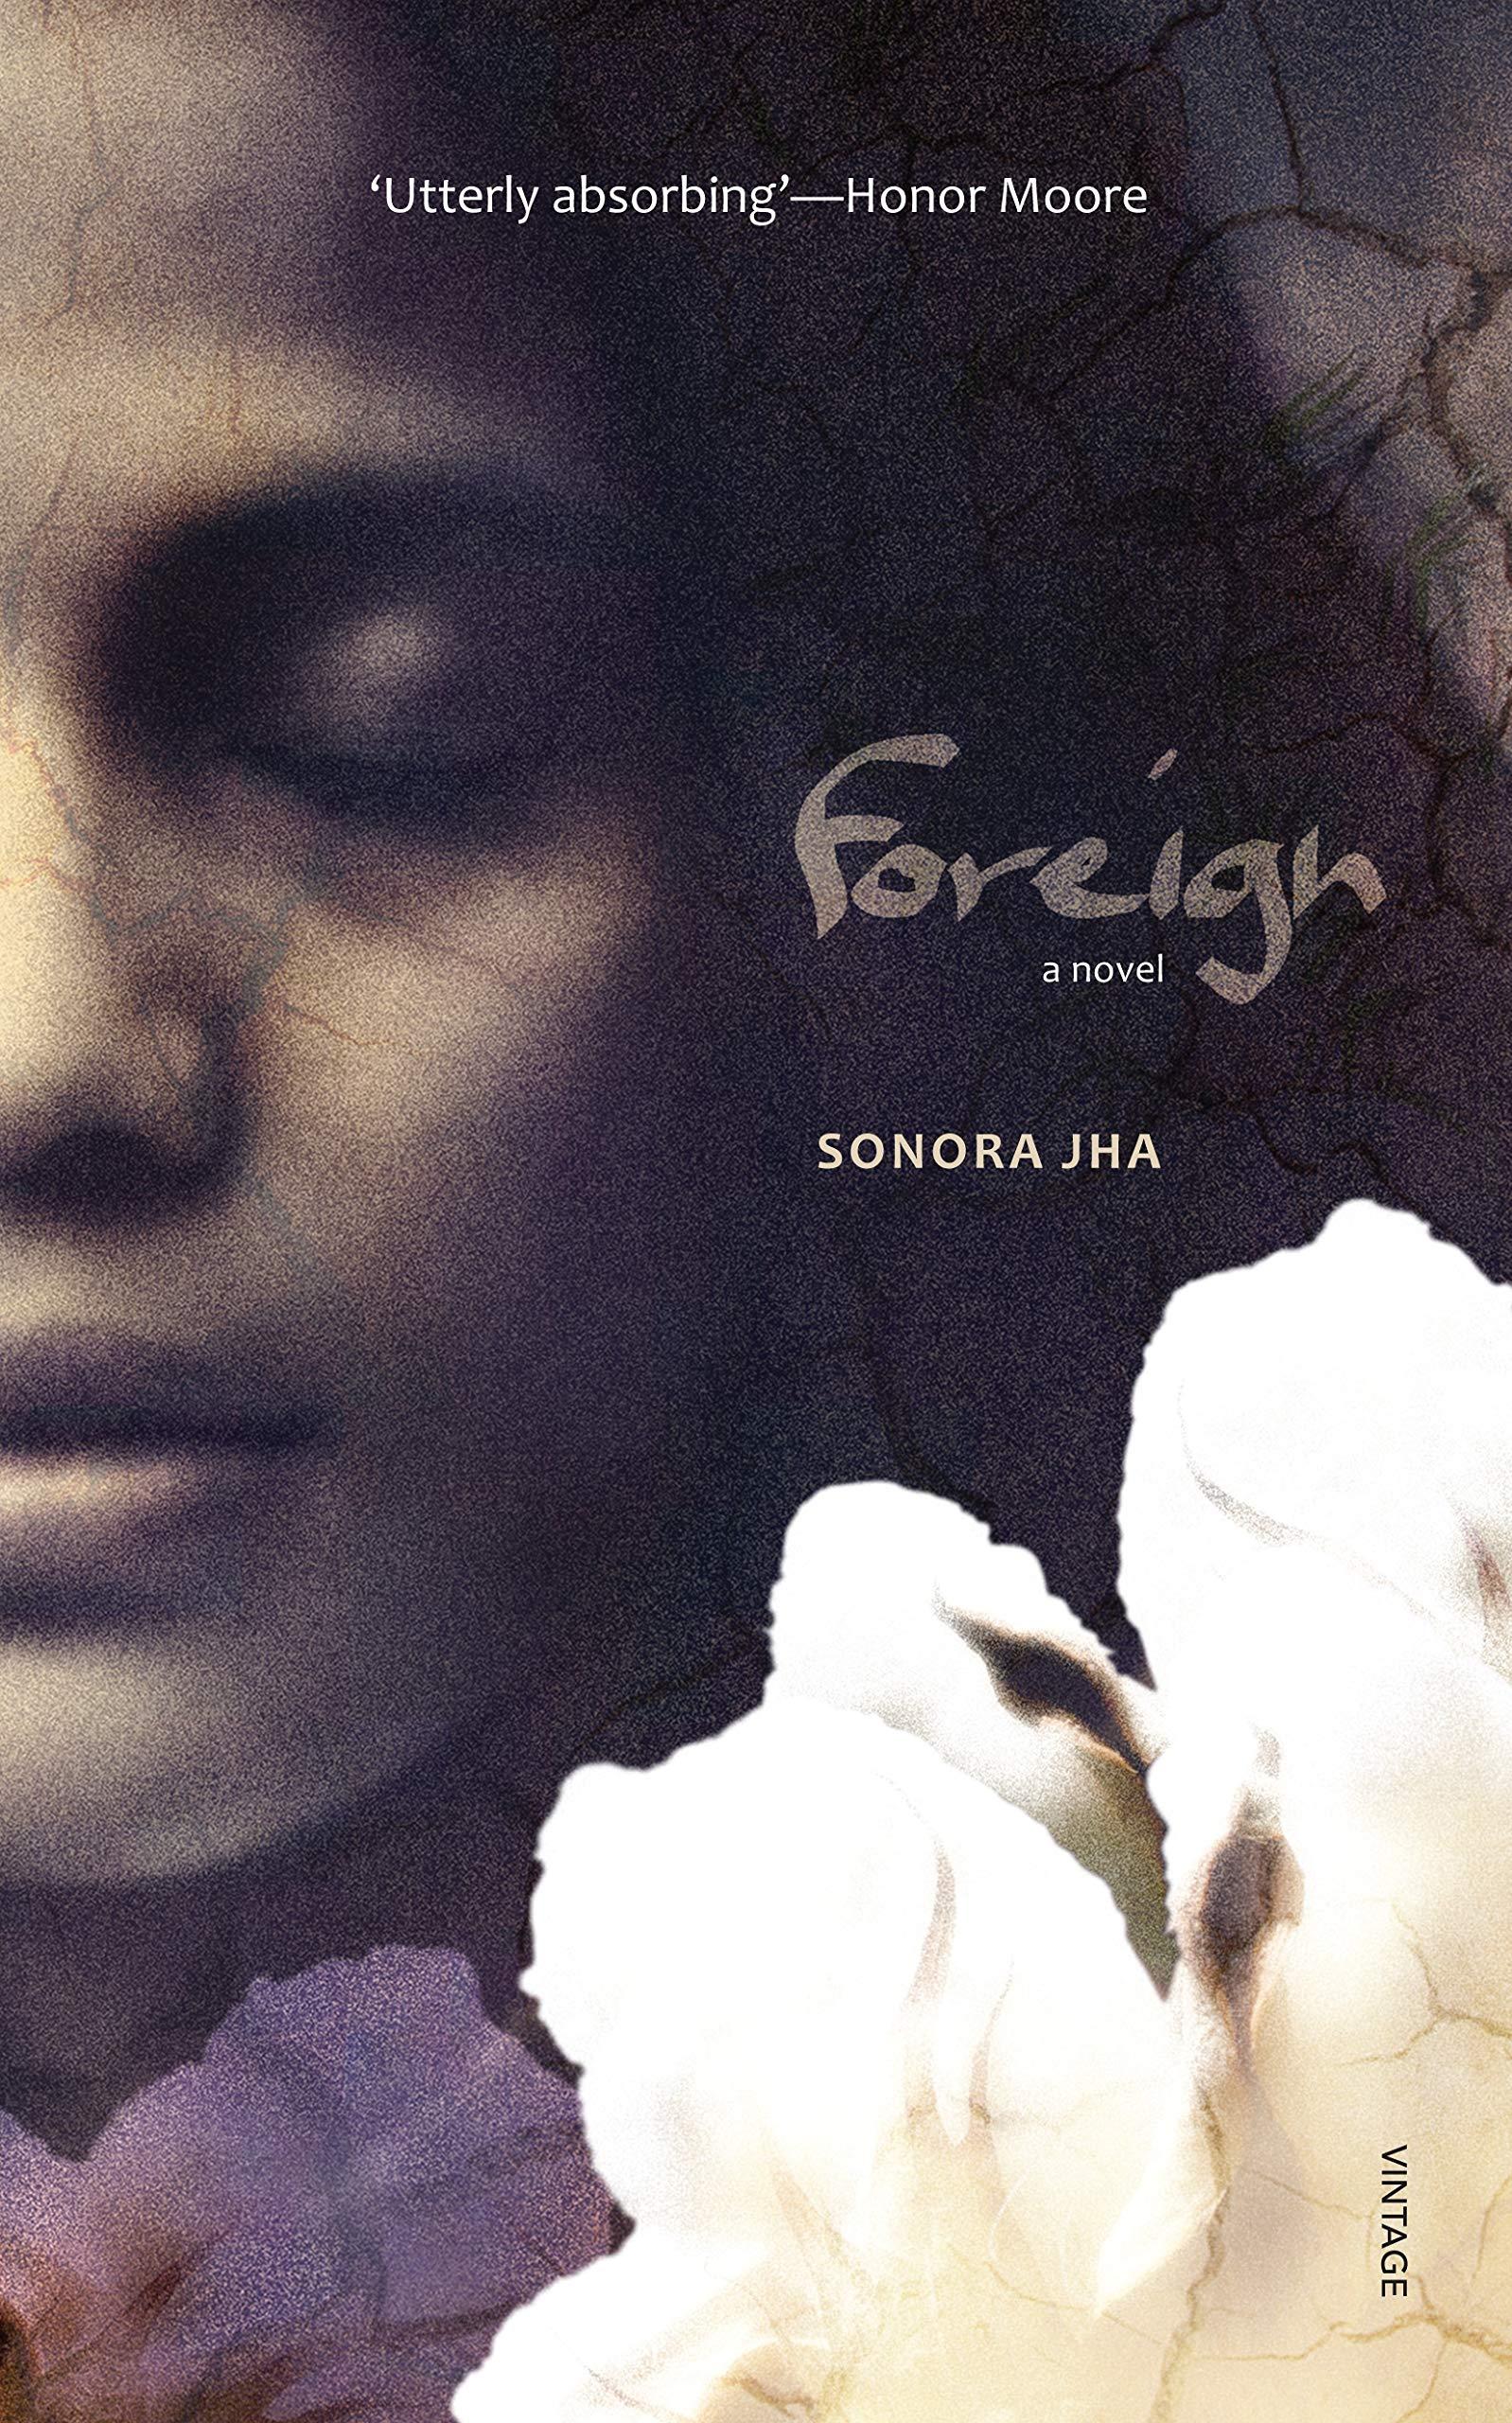 Foreign: A Novel: Sonora Jha: 9788184002829: Amazon.com: Books